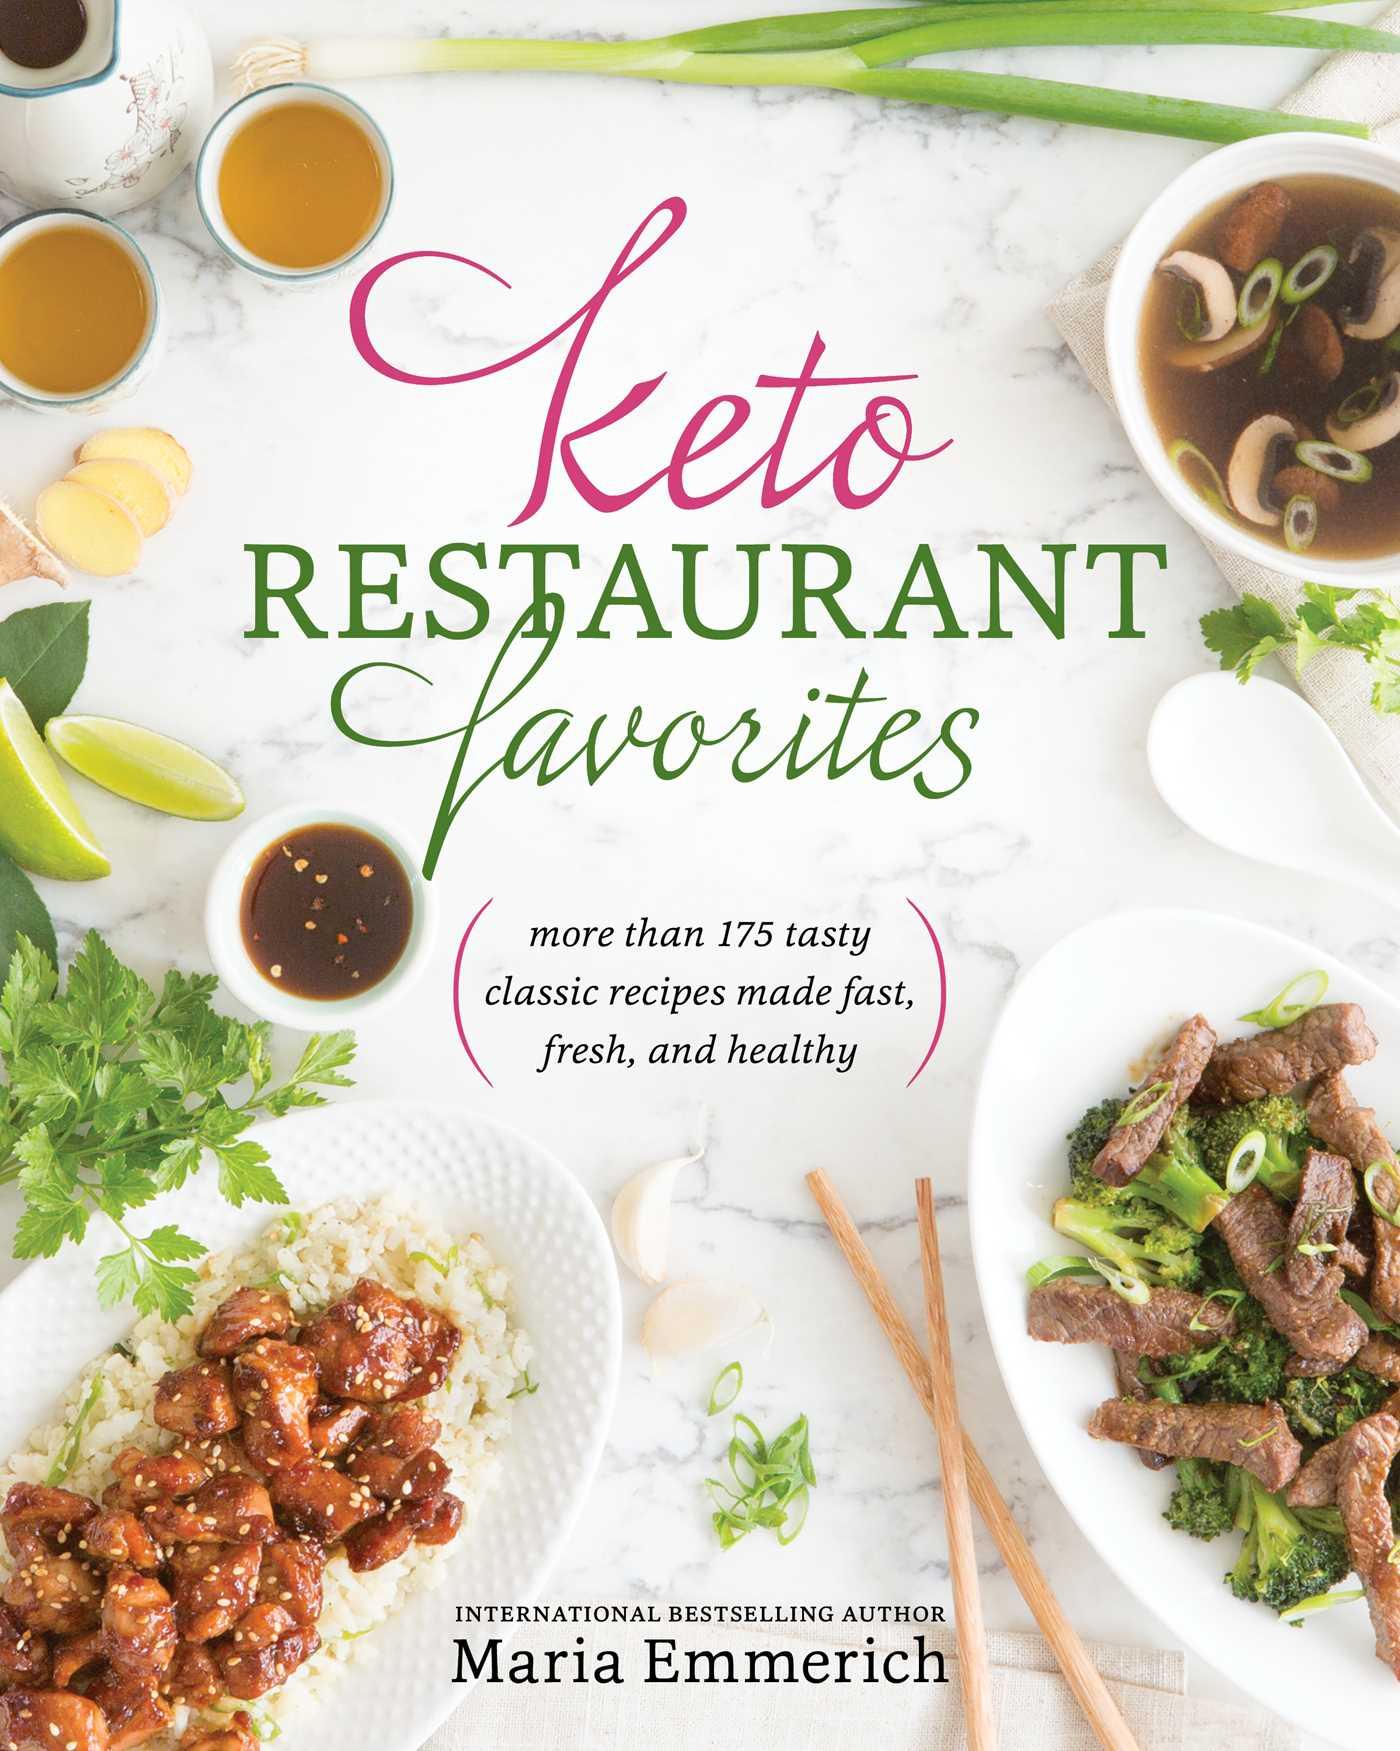 Keto restaurant favorites 9781628602586 hr